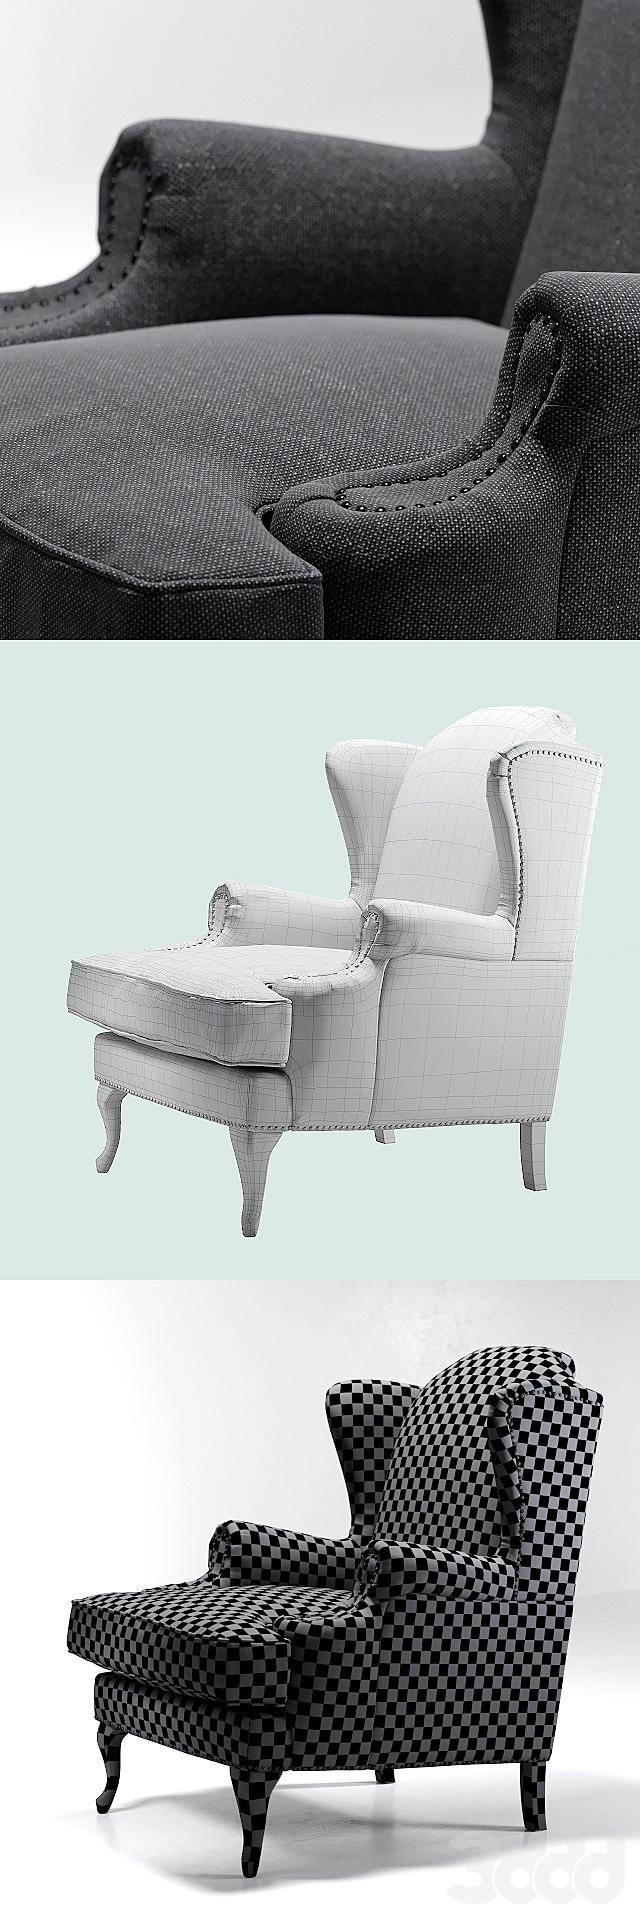 Eichholtz_Chair Frank Sinatra